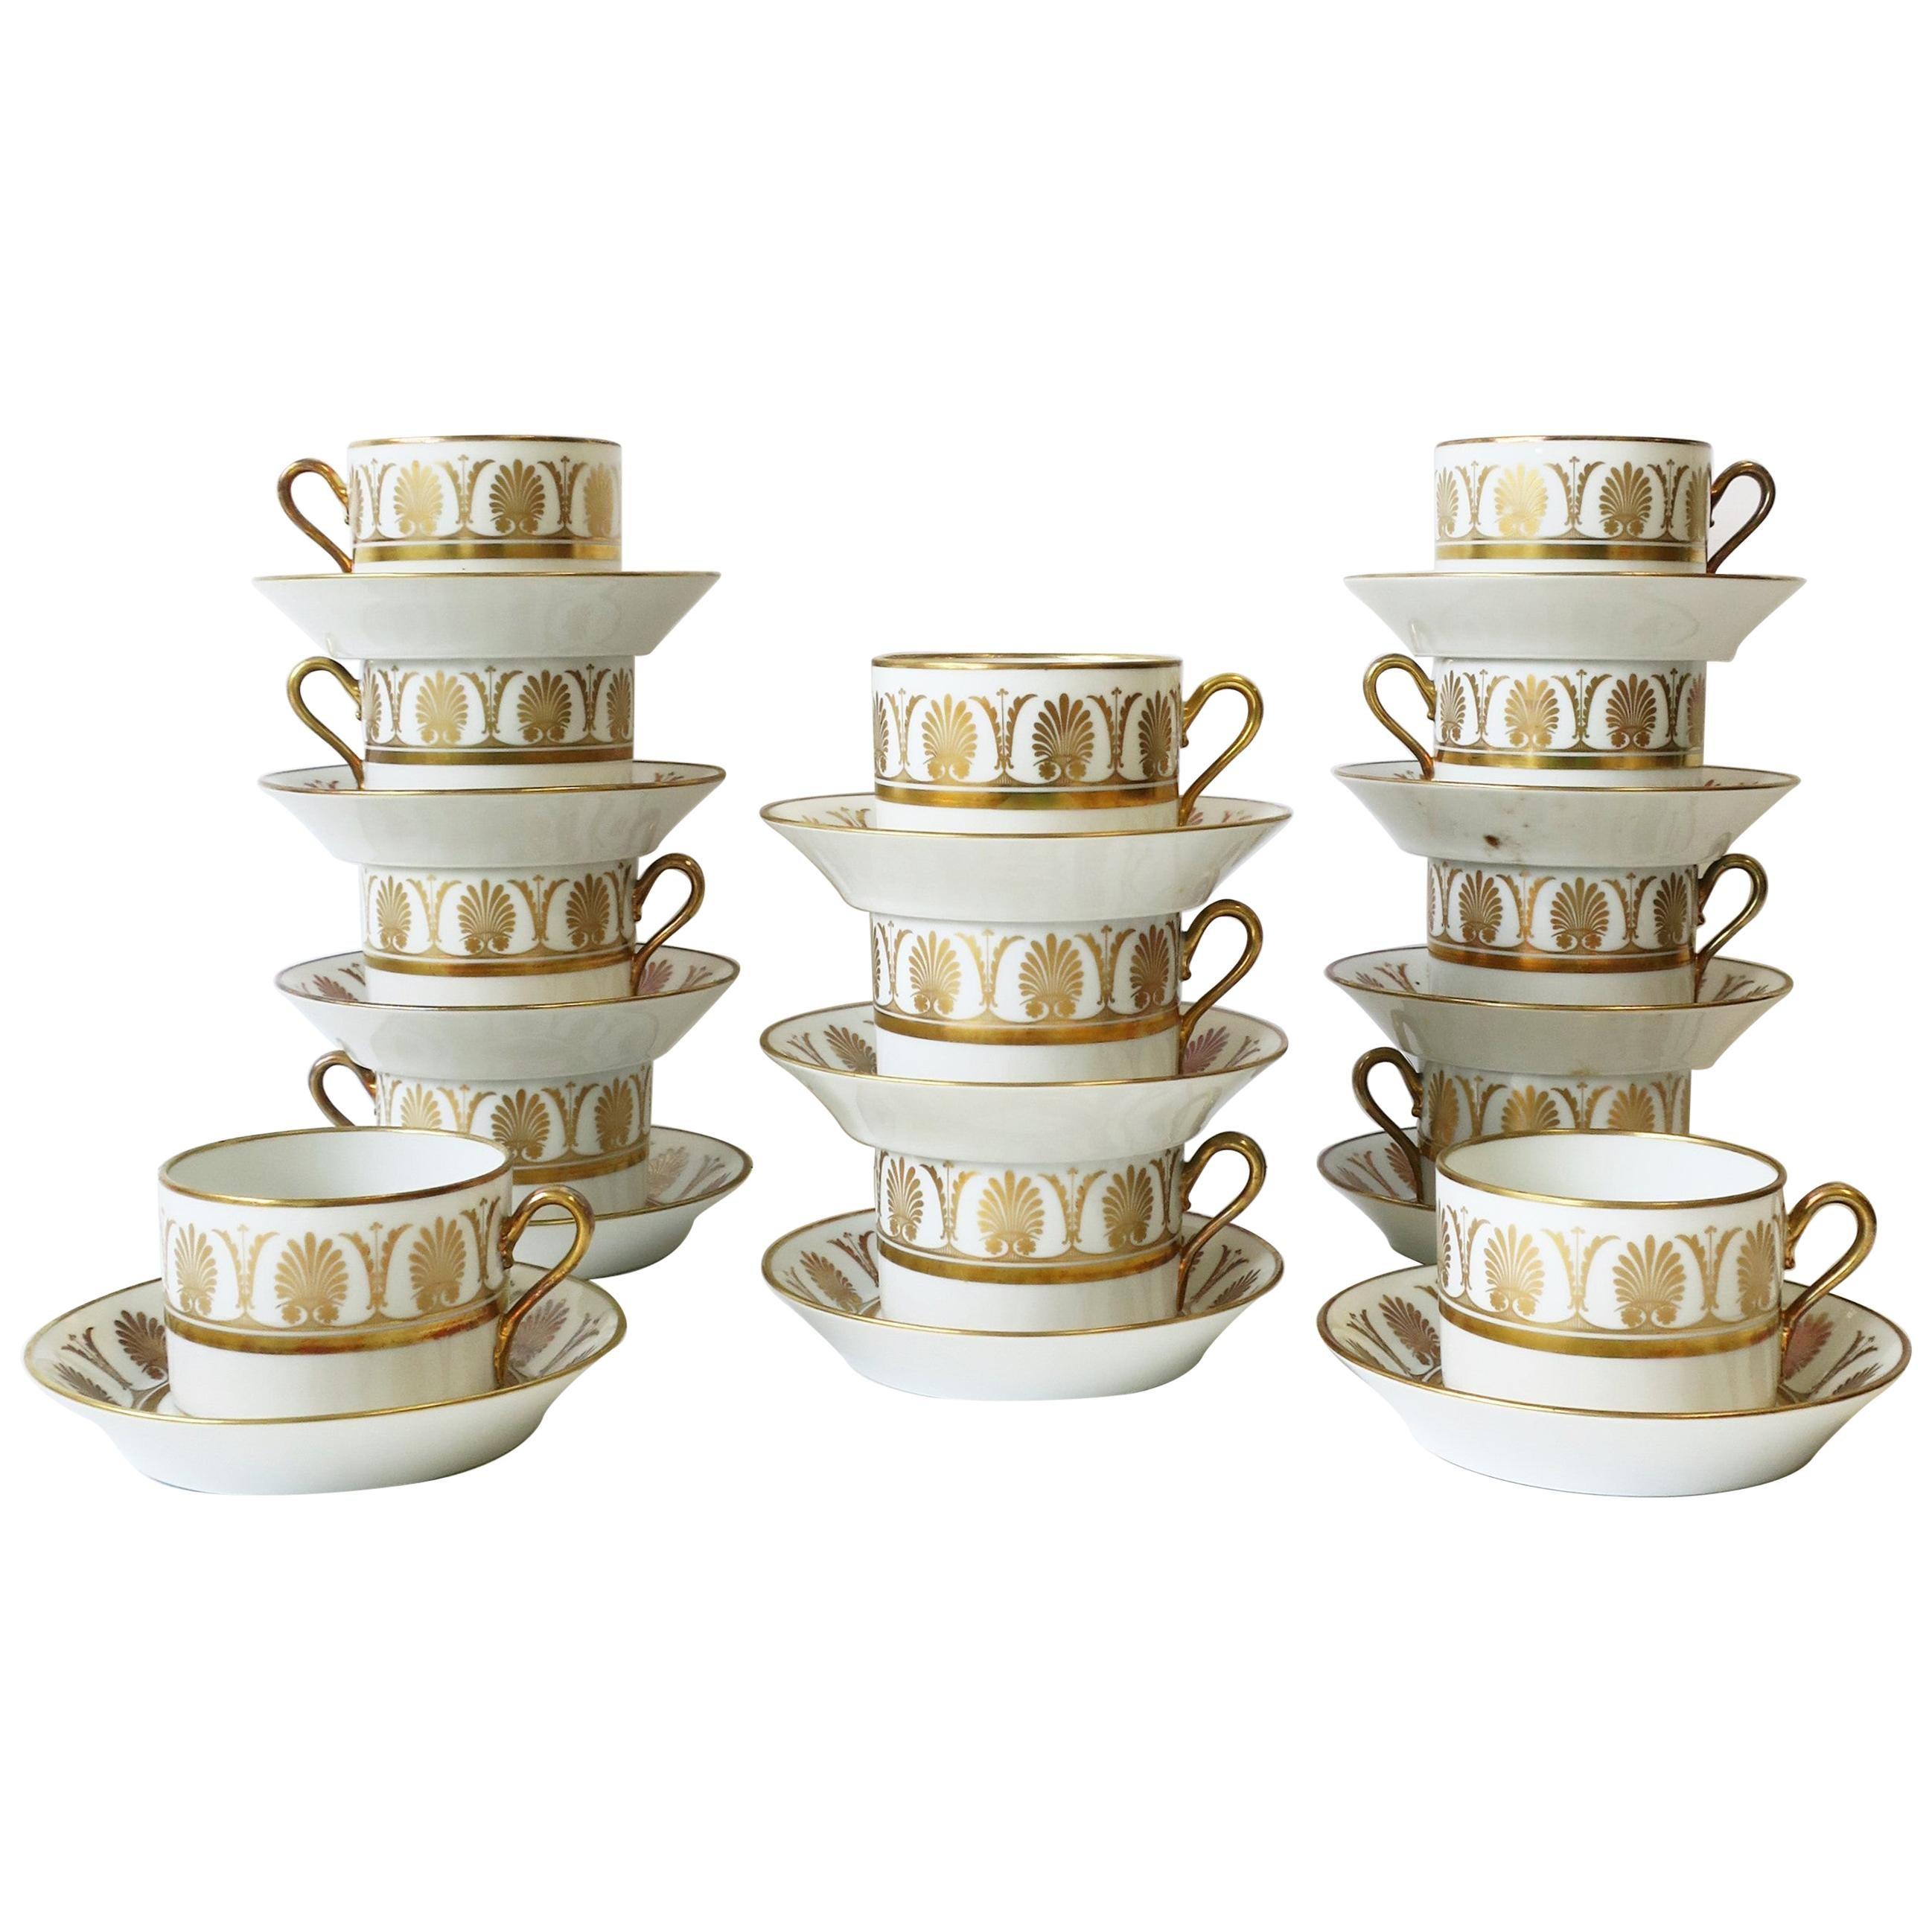 Richard Ginori Designer Italian White & Gold Coffee or Tea Cup Saucer, Set of 12